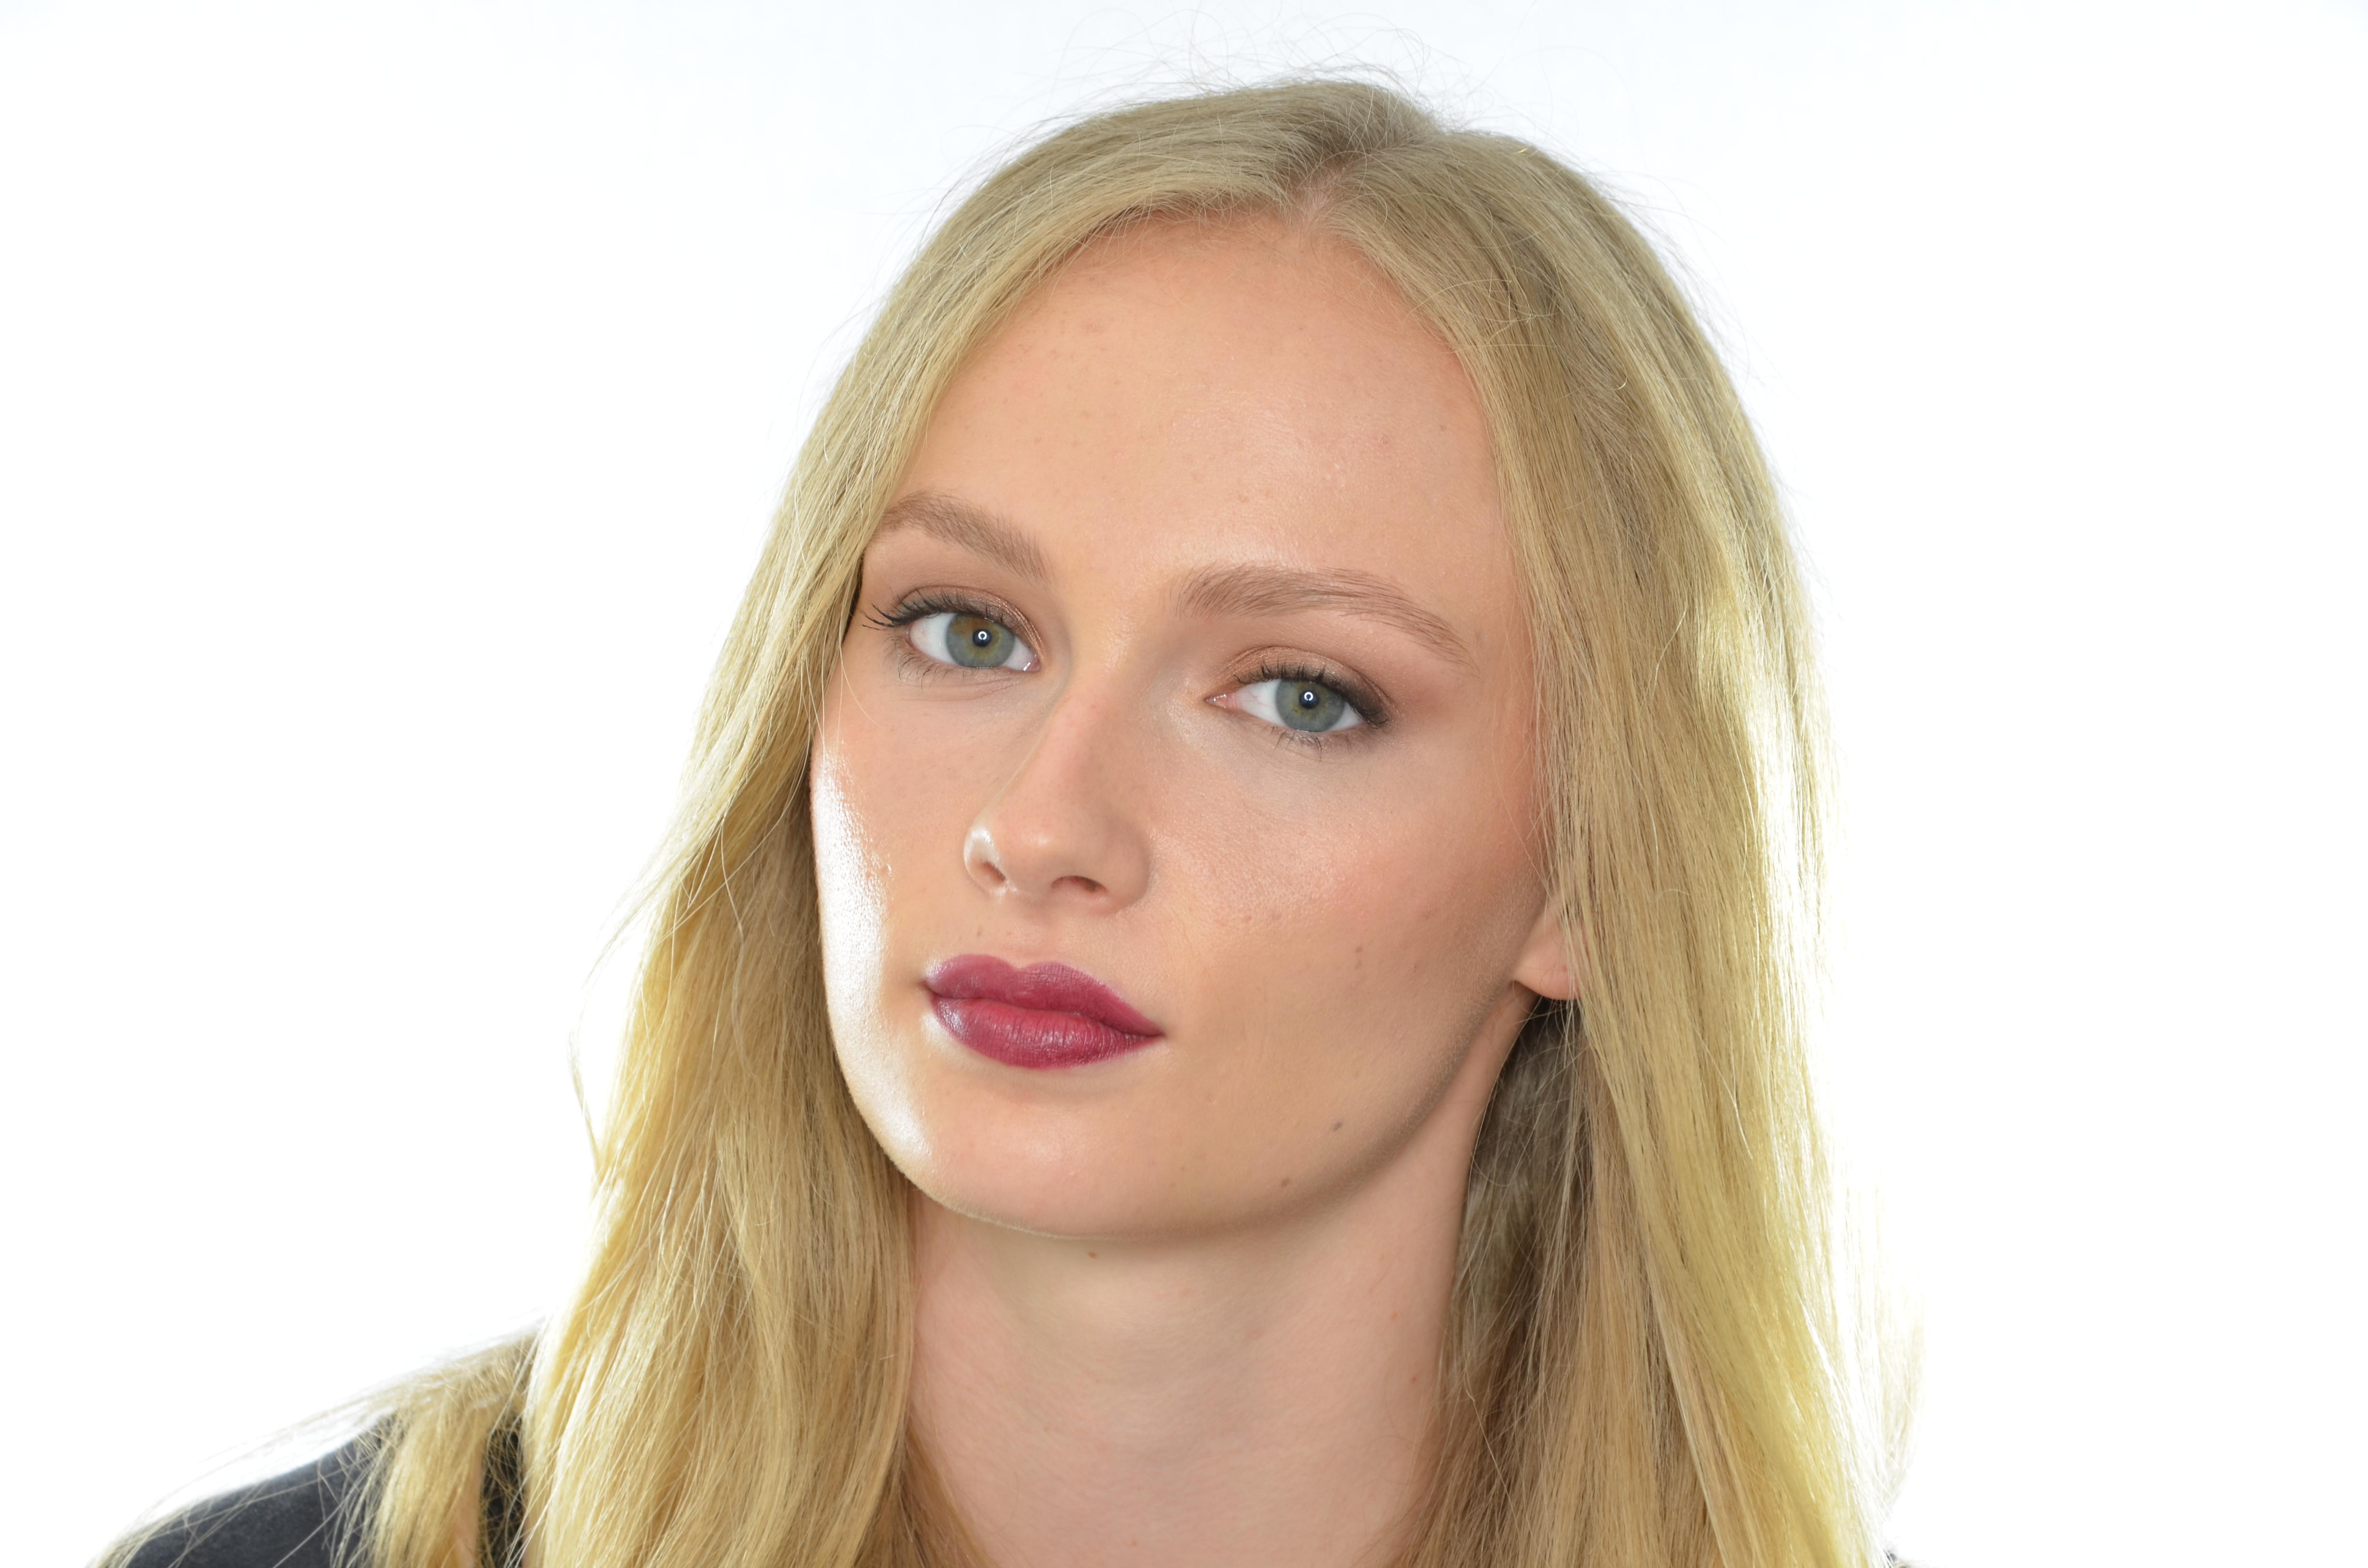 burgundy lips #1